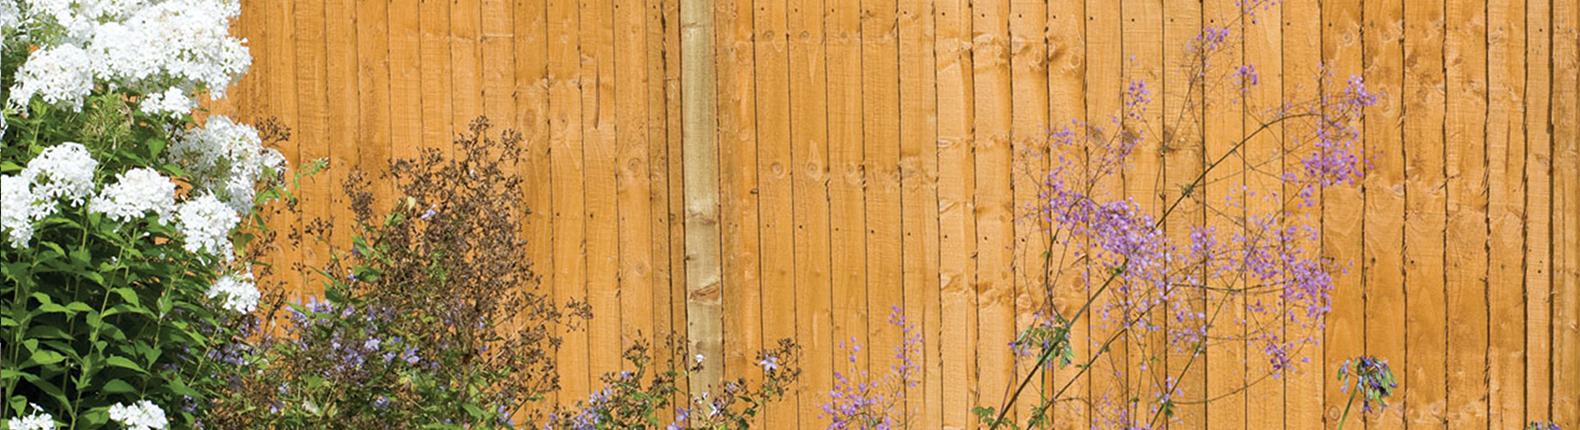 A Guide to Closeboard Fencing - AVS Fencing Supplies